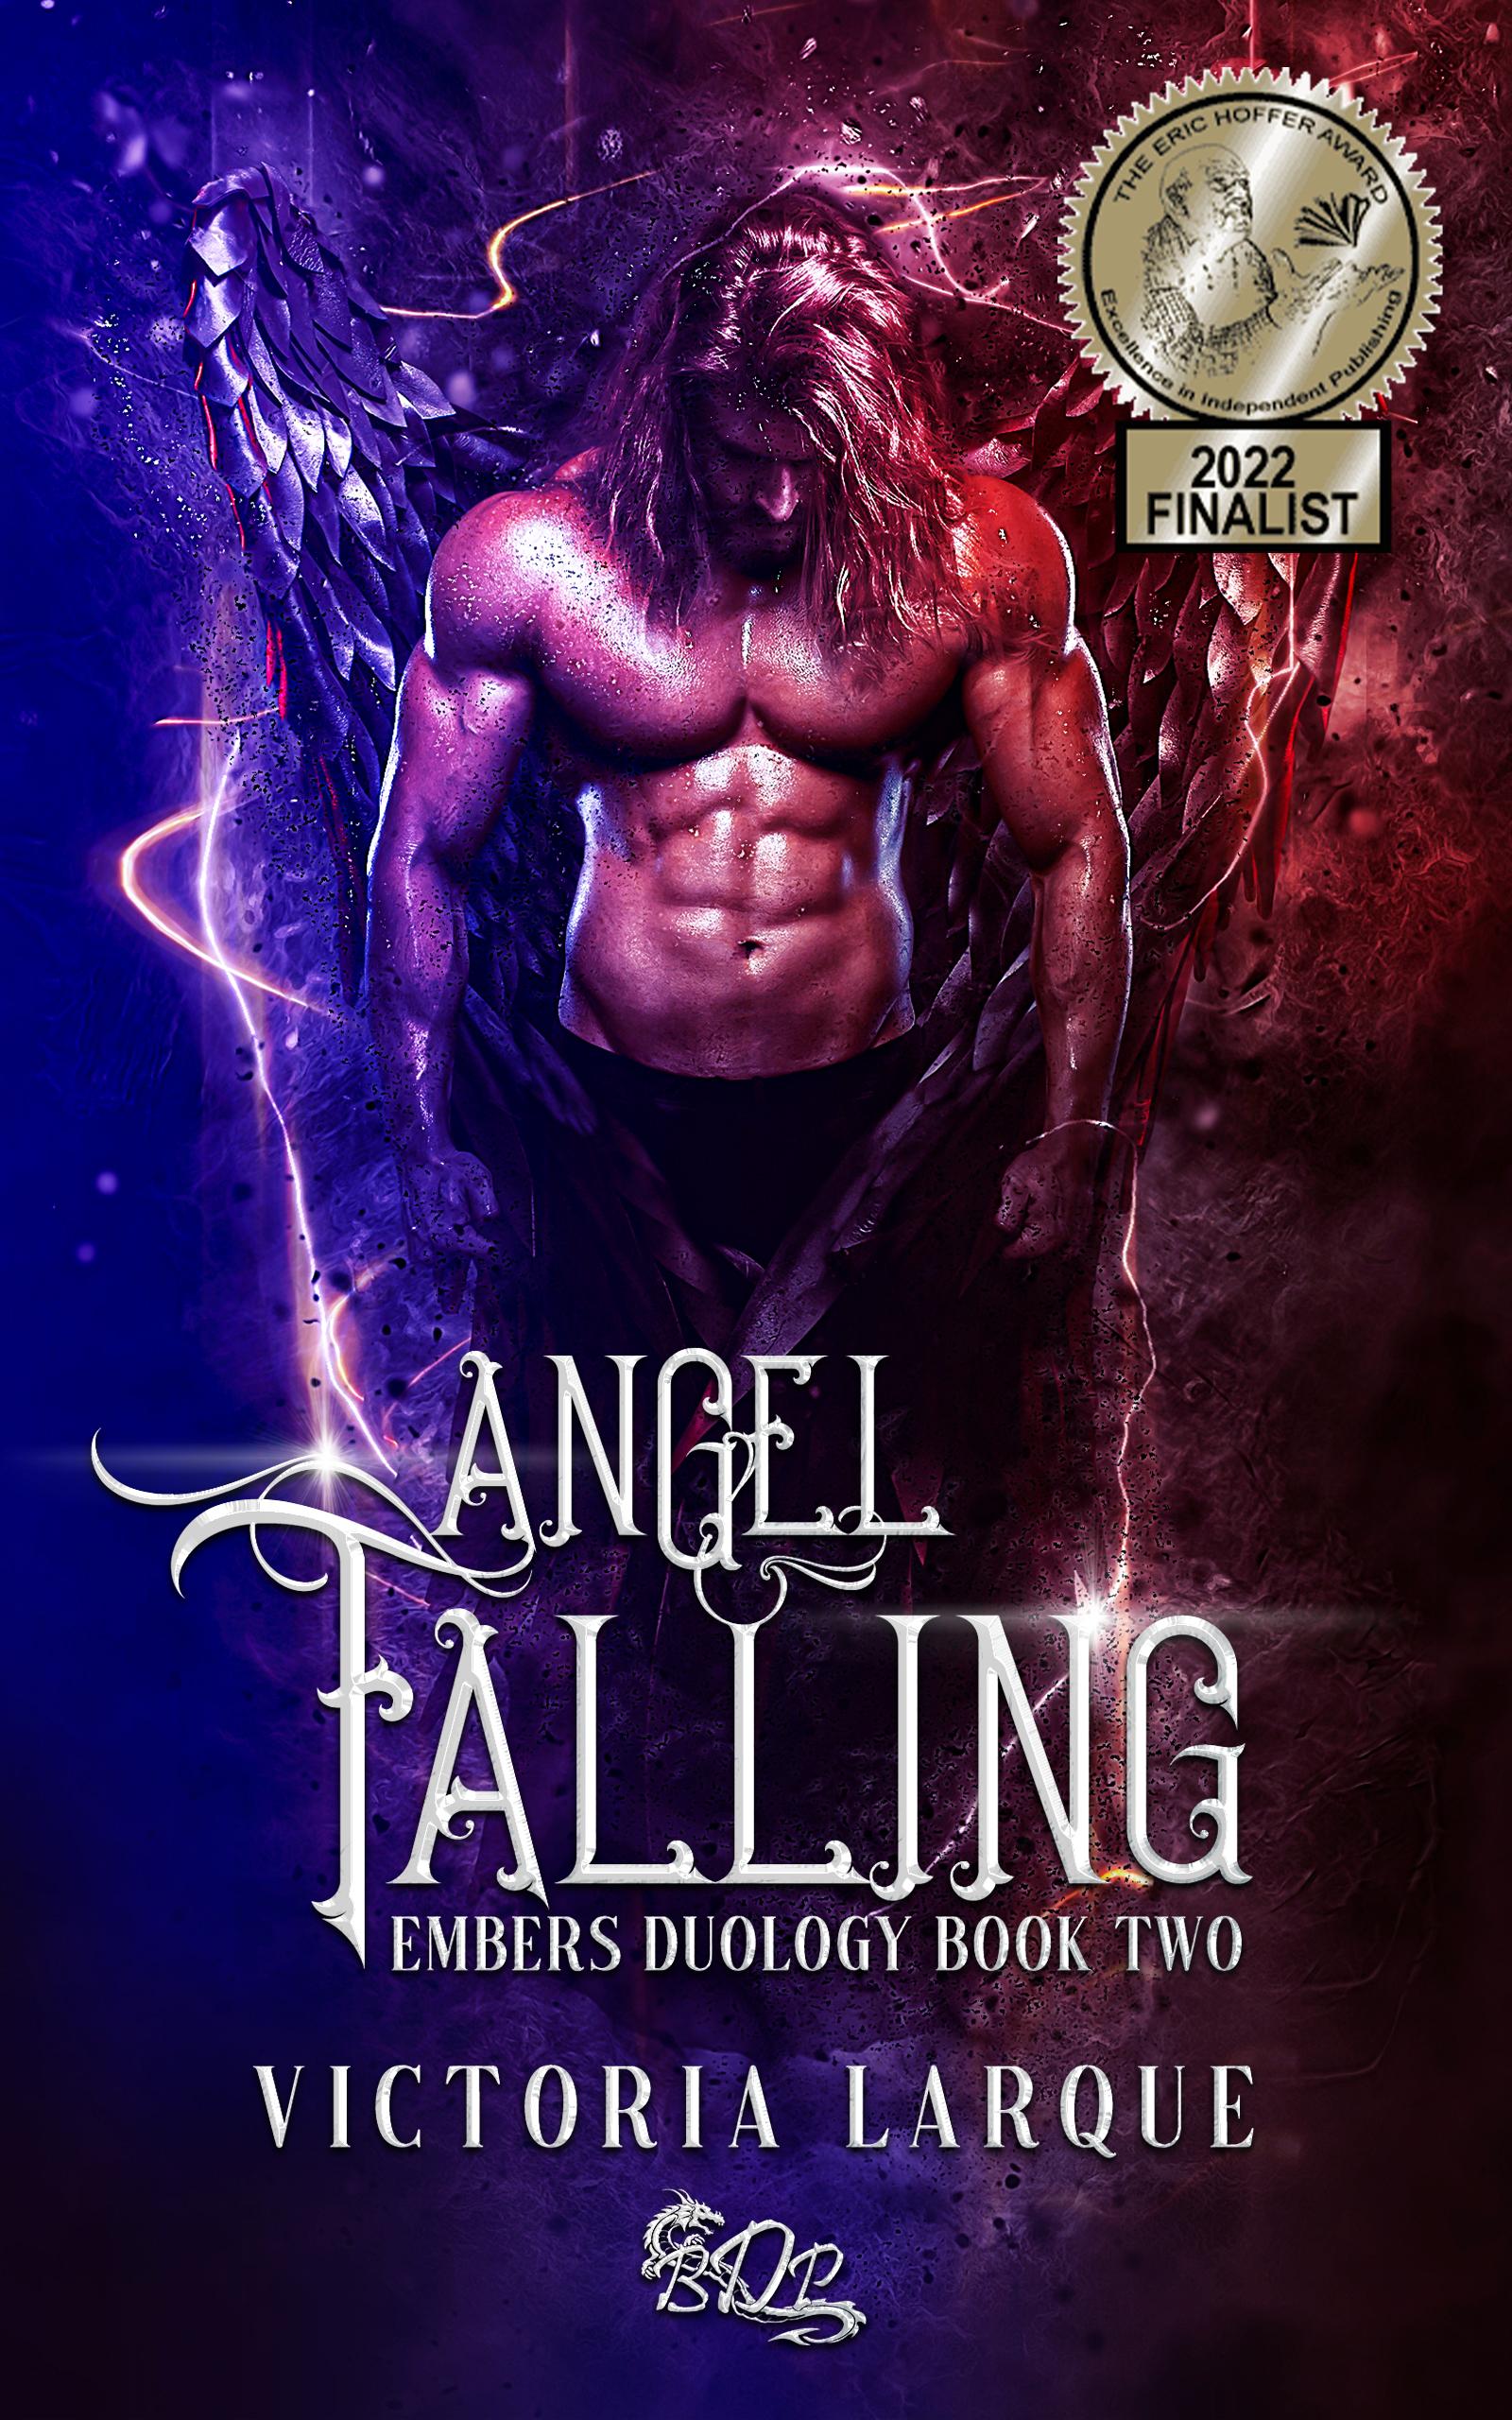 Embers Duology - Angel Falling, Victoria Larque, Butterdragons